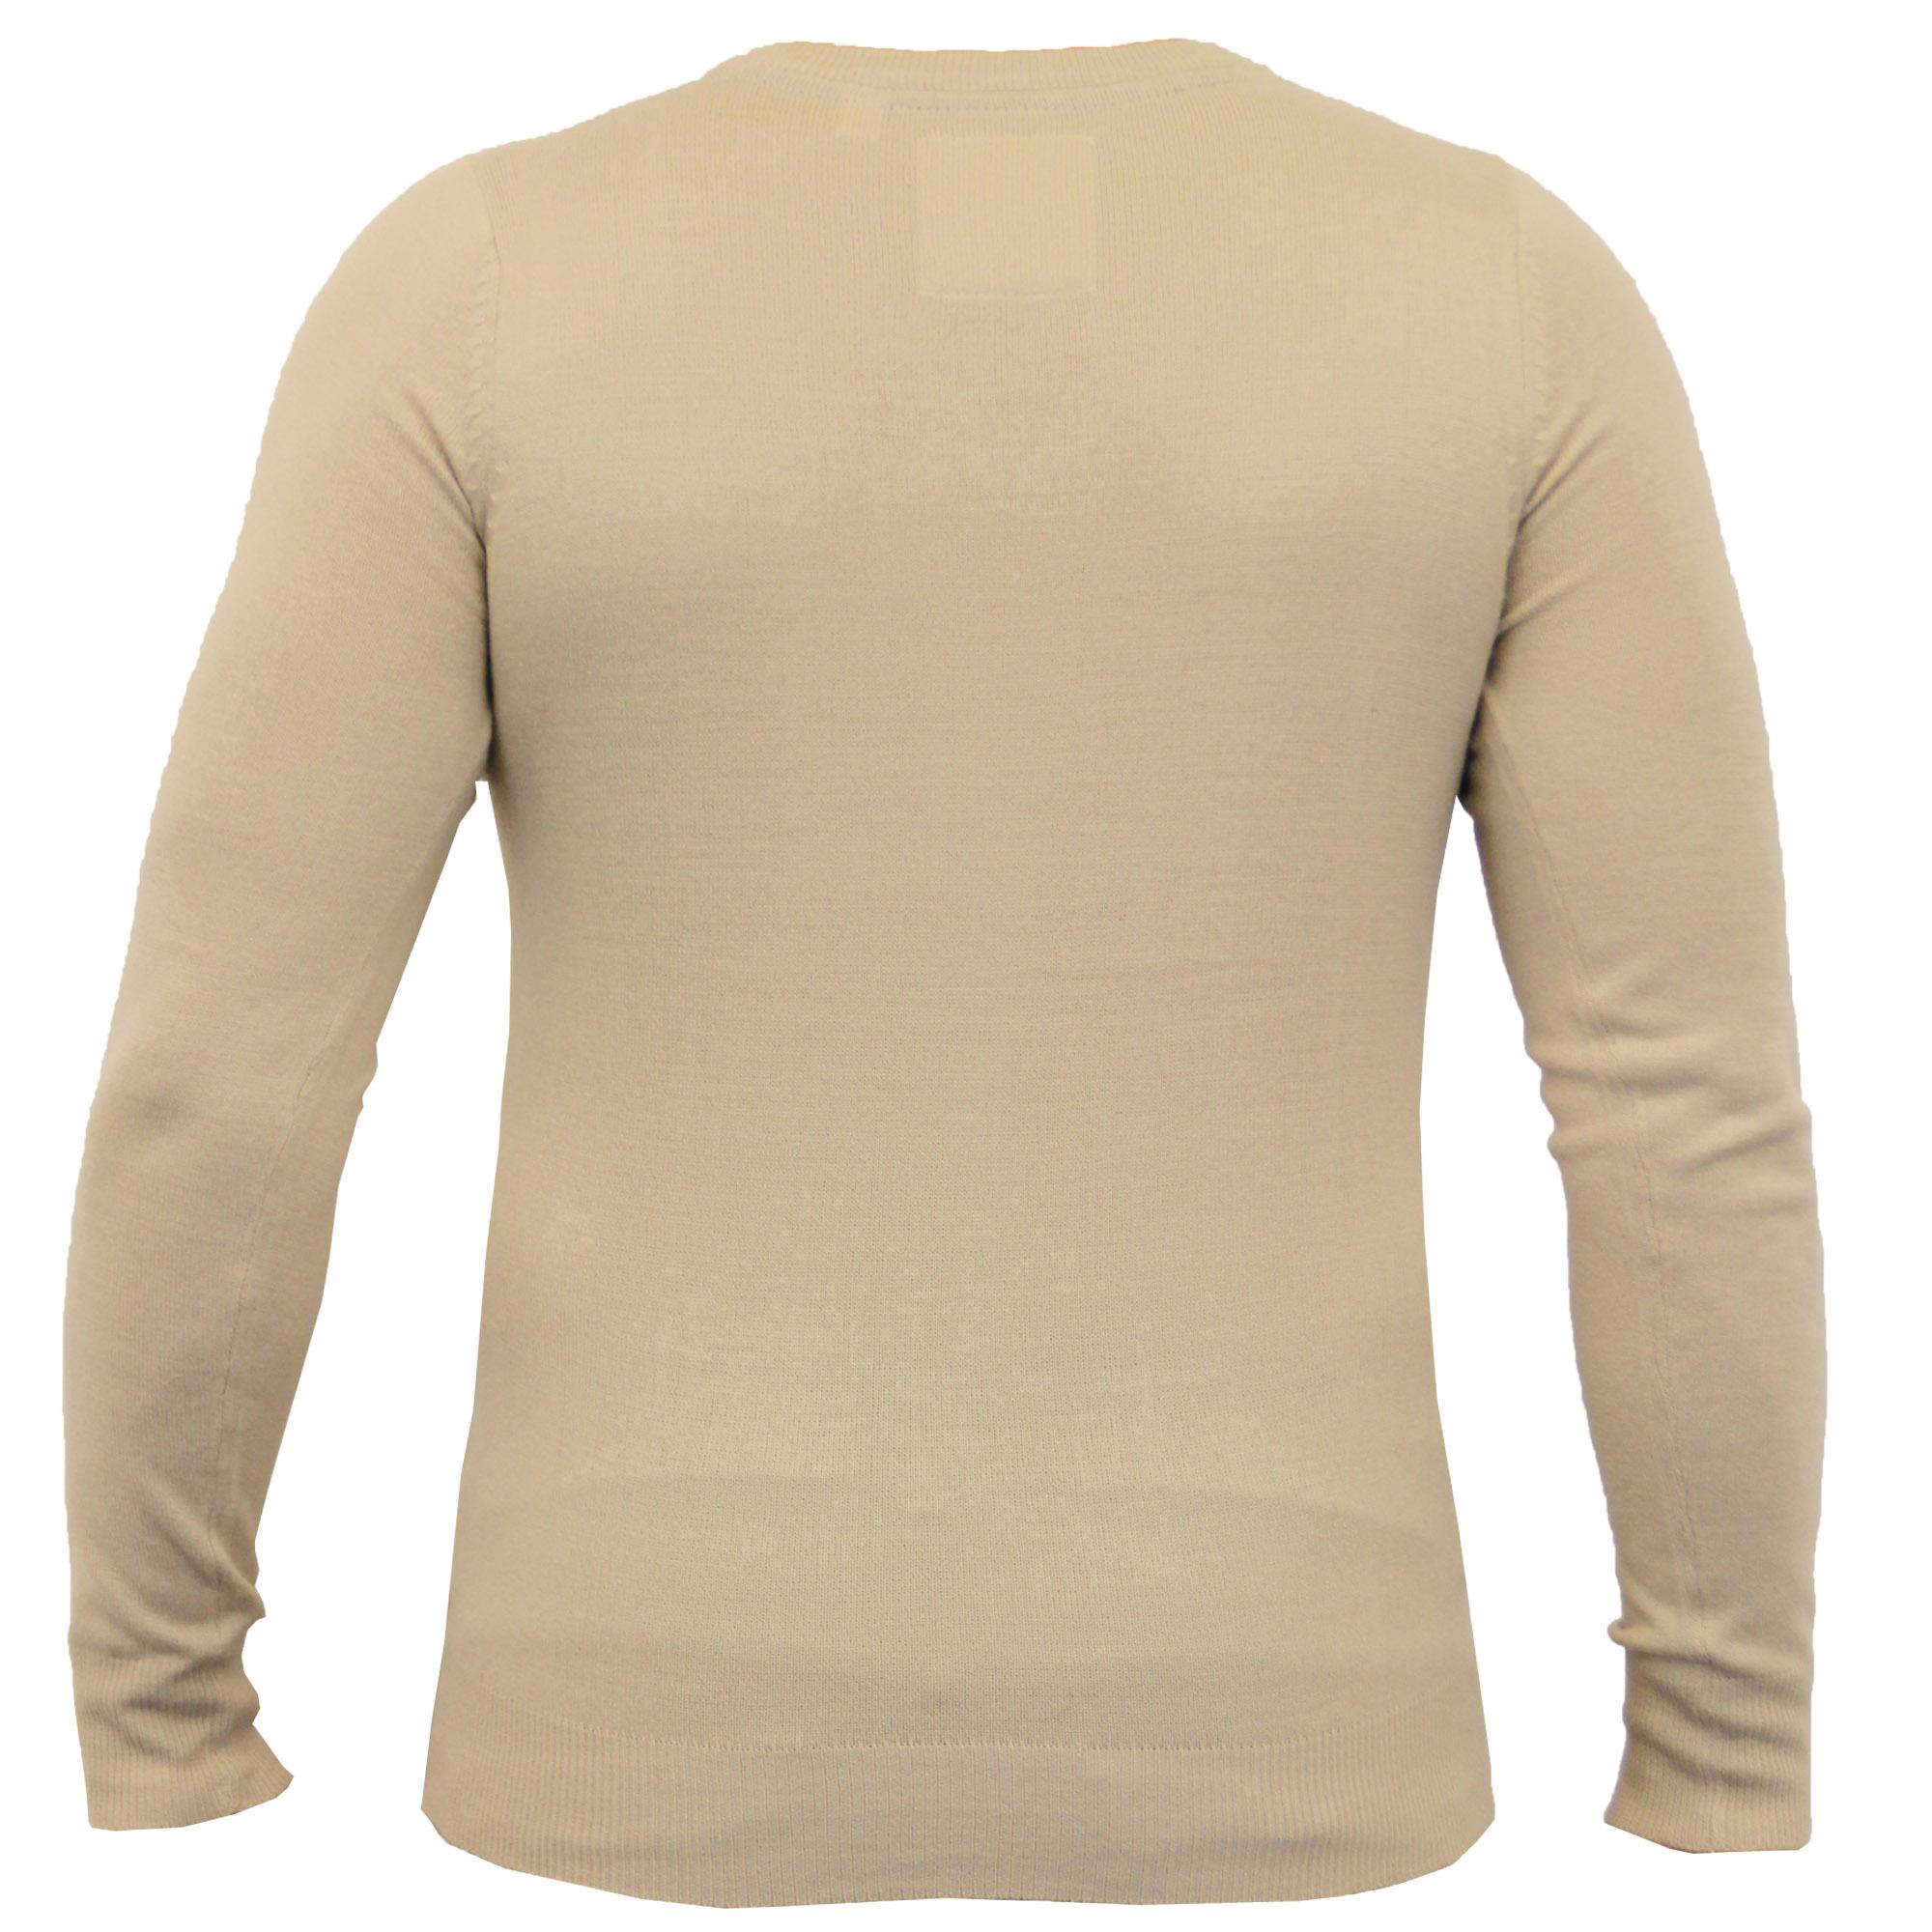 Mens-Jumper-Soul-Star-Knitted-Sweater-Pullover-Crew-V-Neck-Lightweight-Winter thumbnail 12